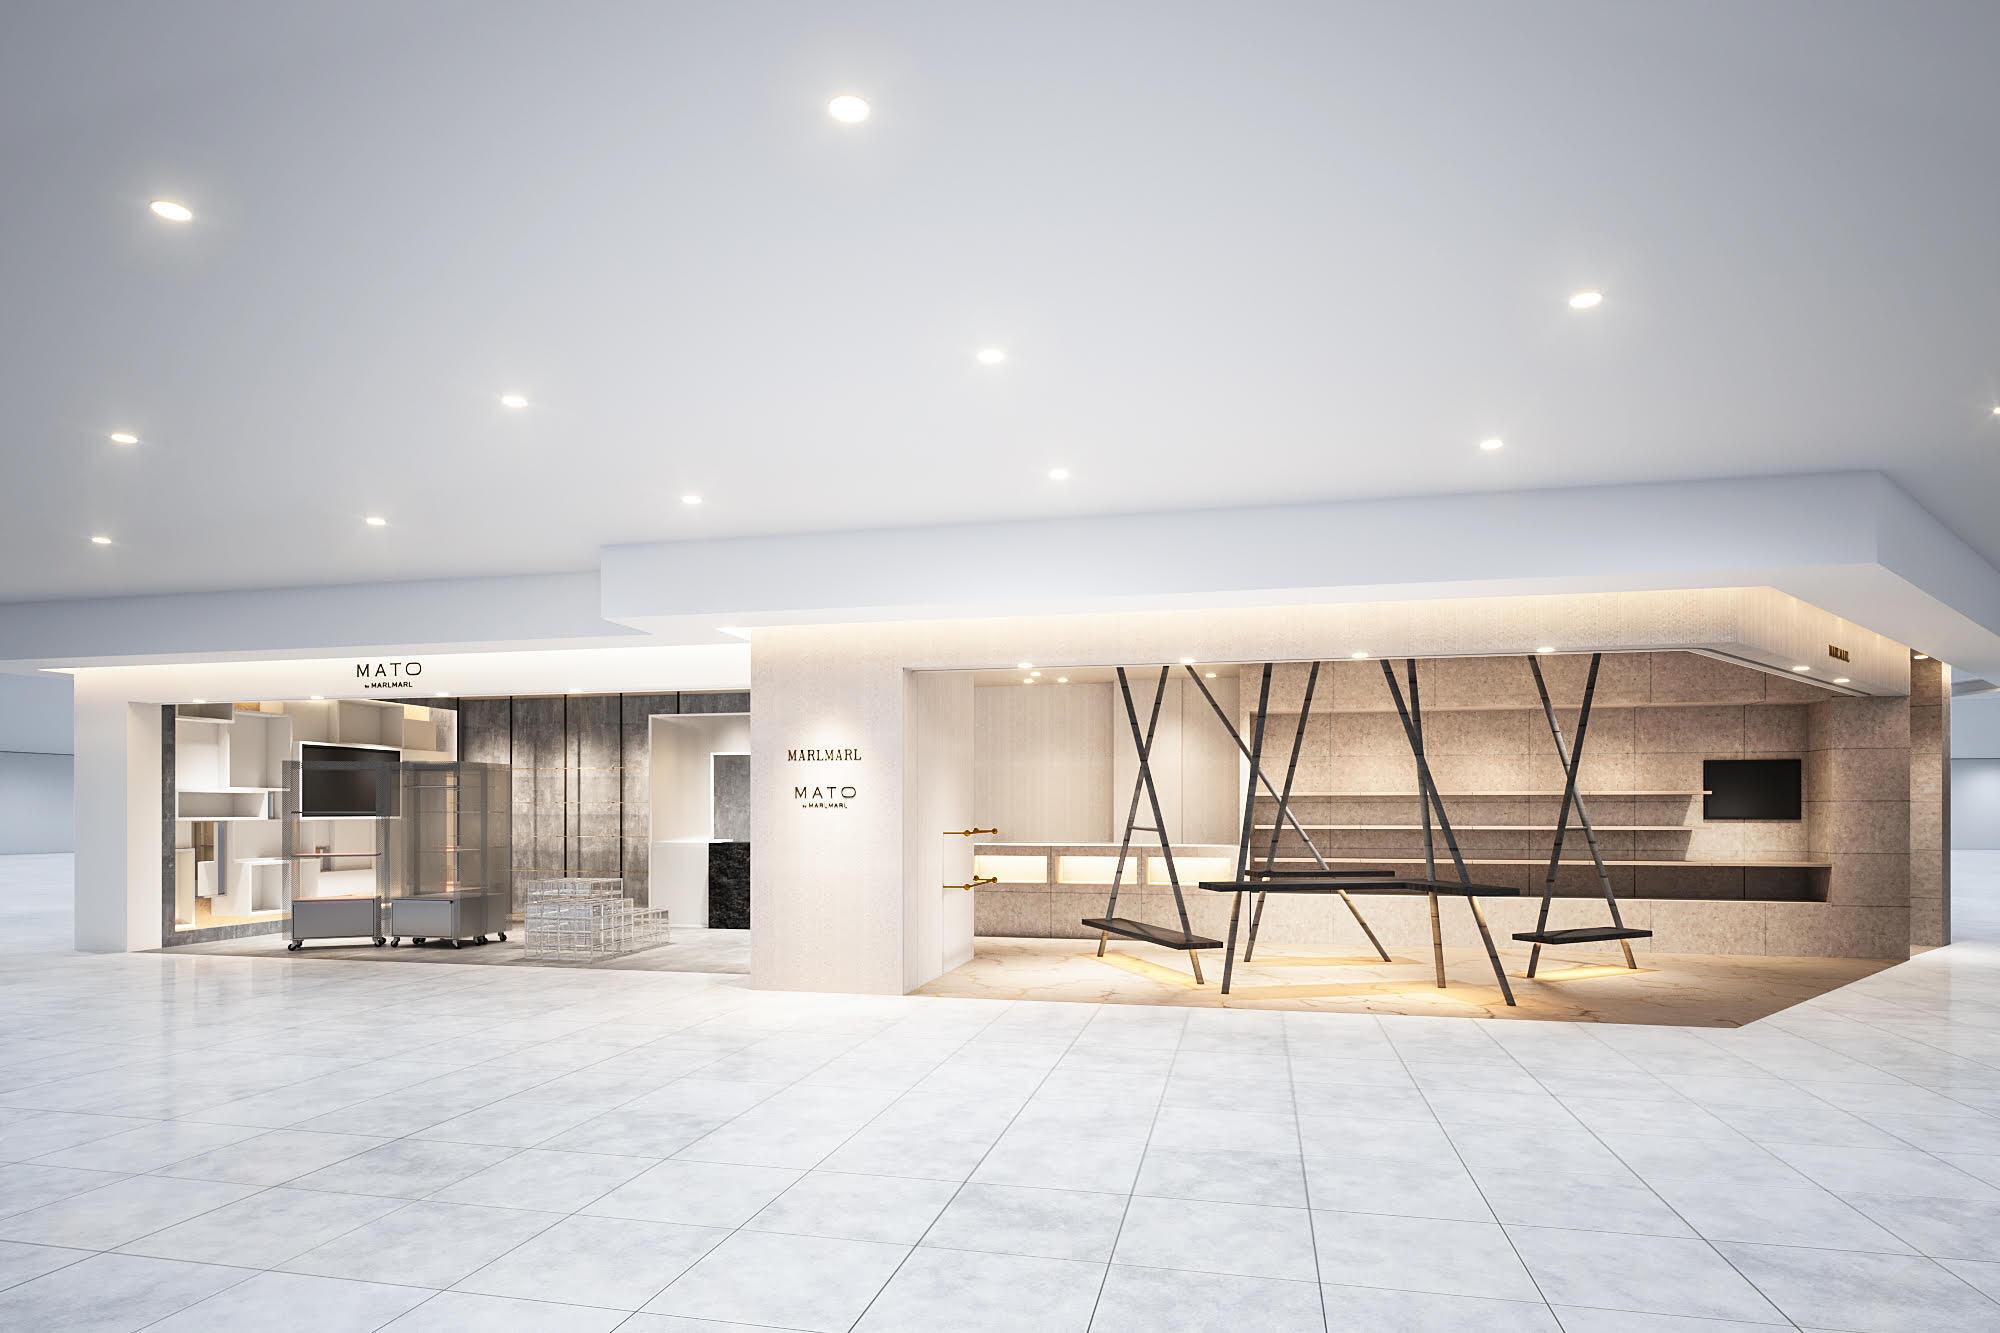 <9/8 wed.>予告!GINZA SIXに新店舗がオープン|出産祝い・ギフトならMARLMARLのスタイ